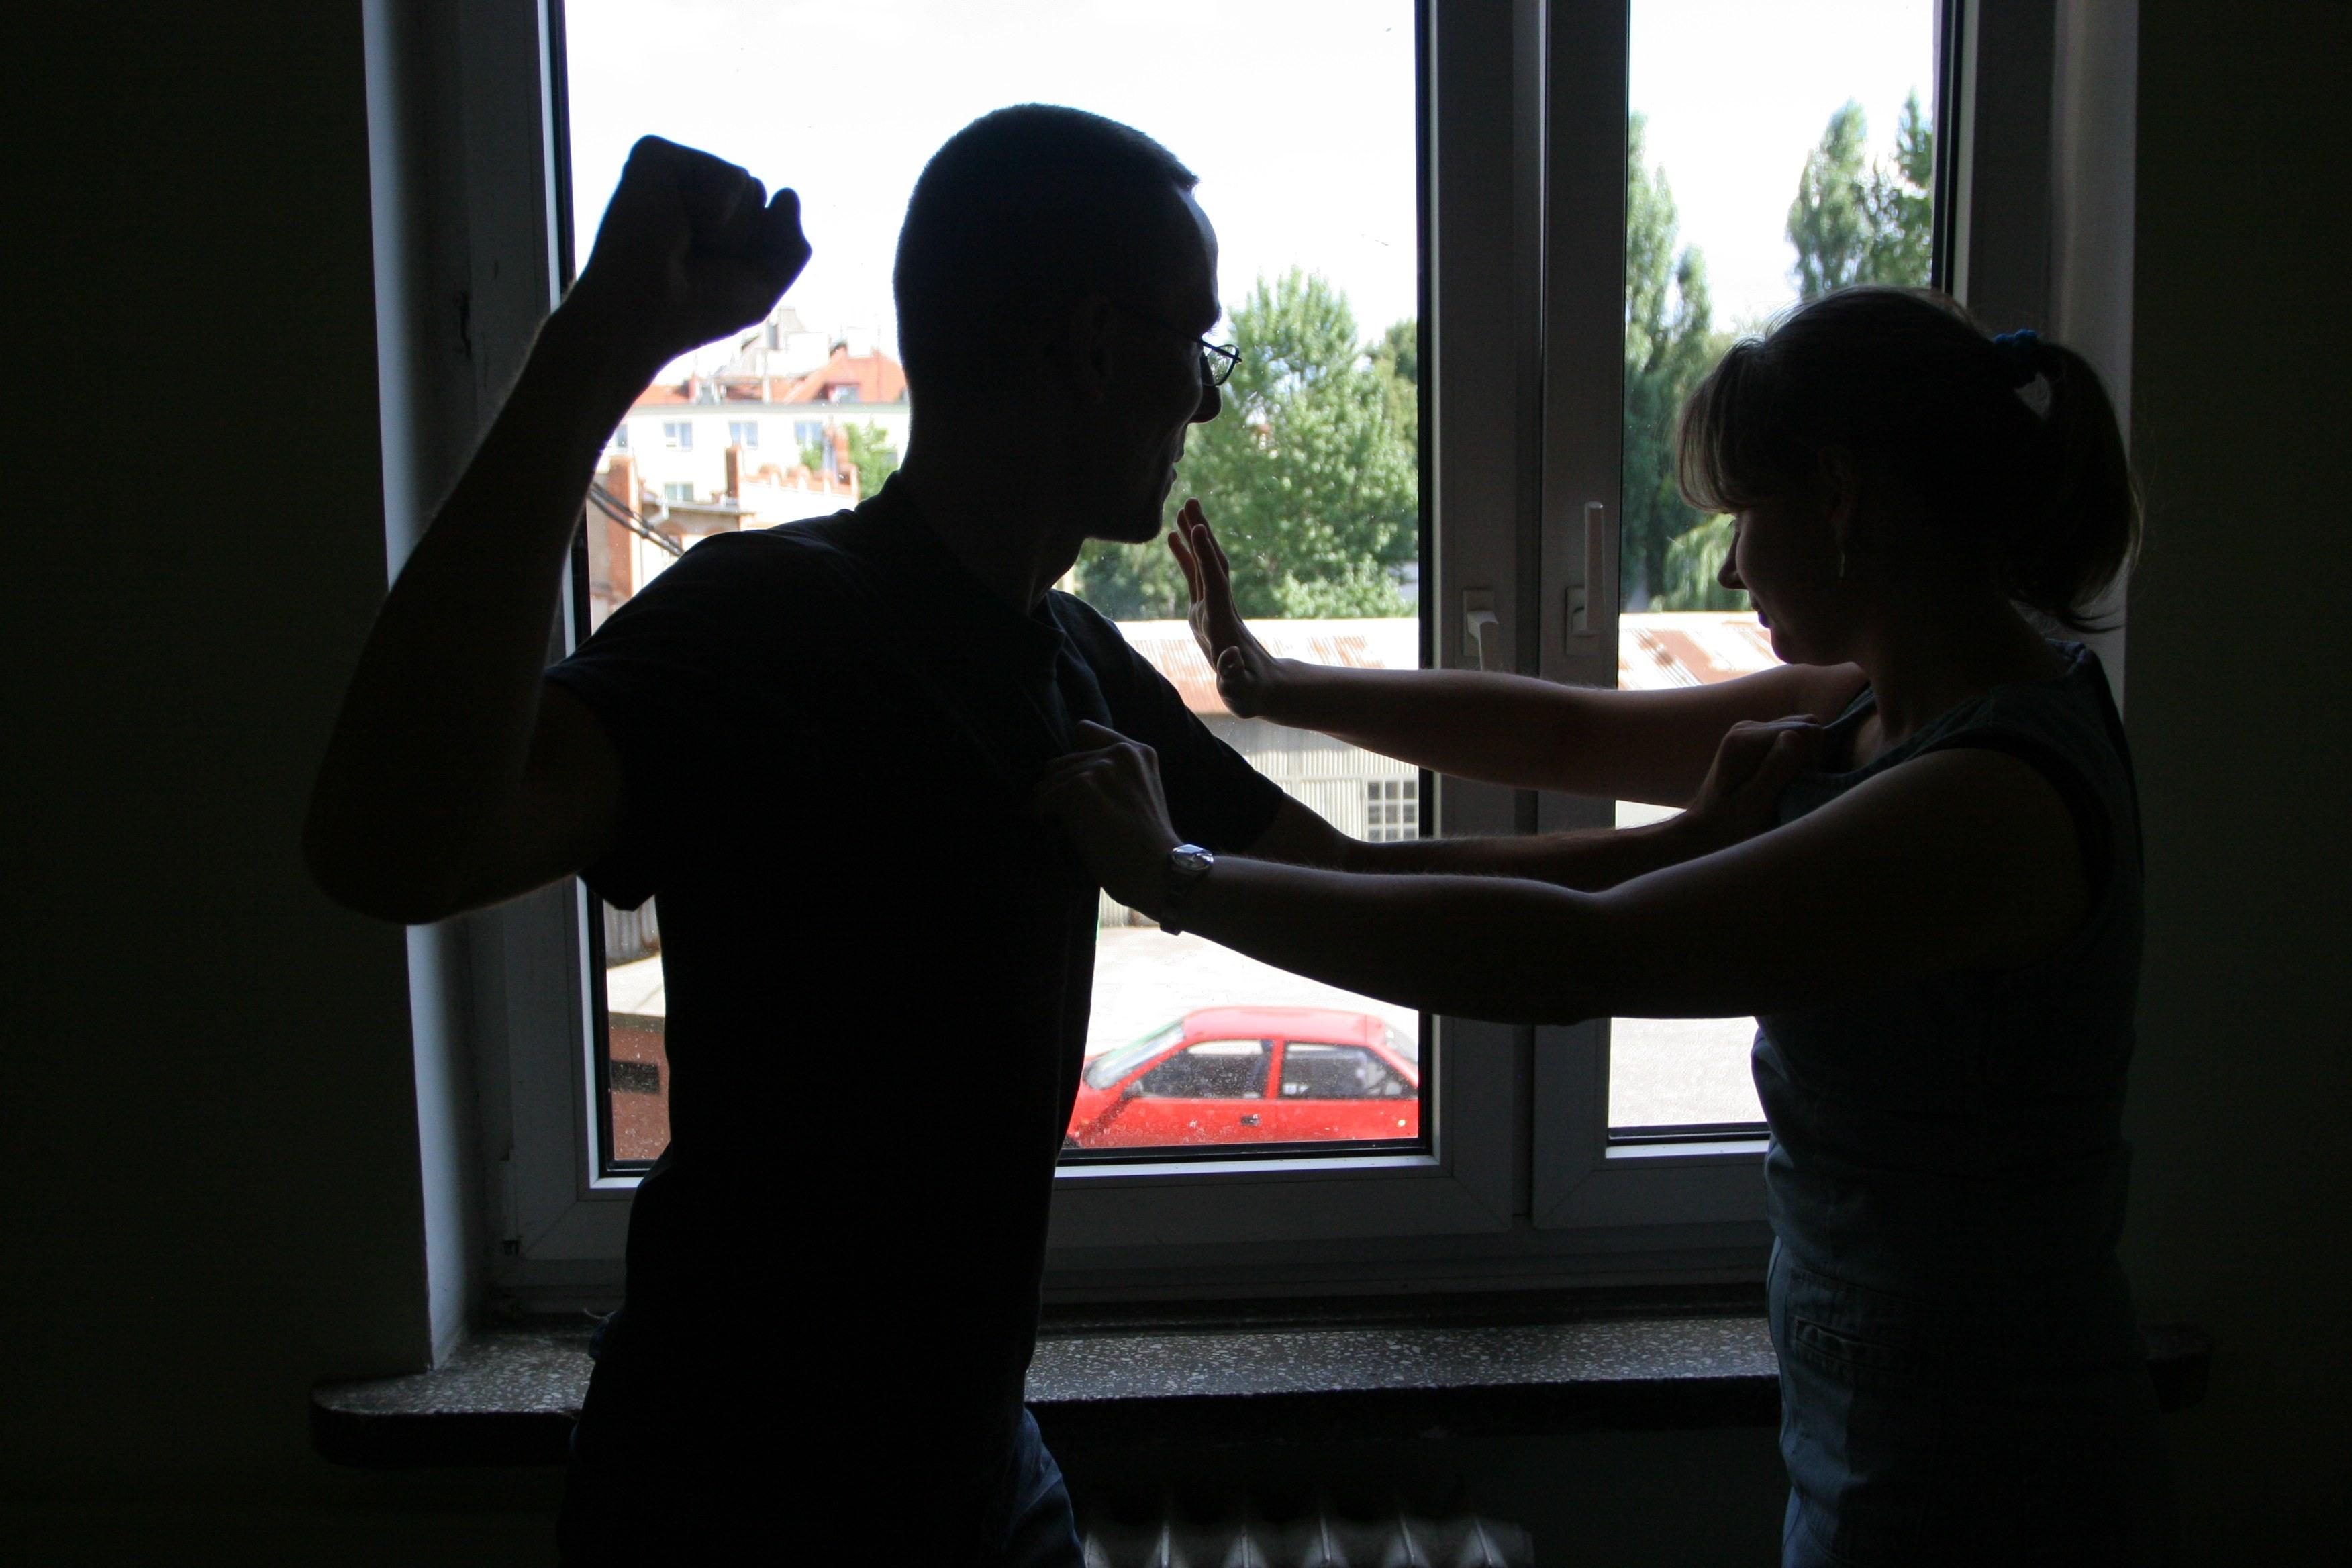 https://m.wm.pl/2017/09/orig/przemoc-beata-szyman-ska-417480.jpg